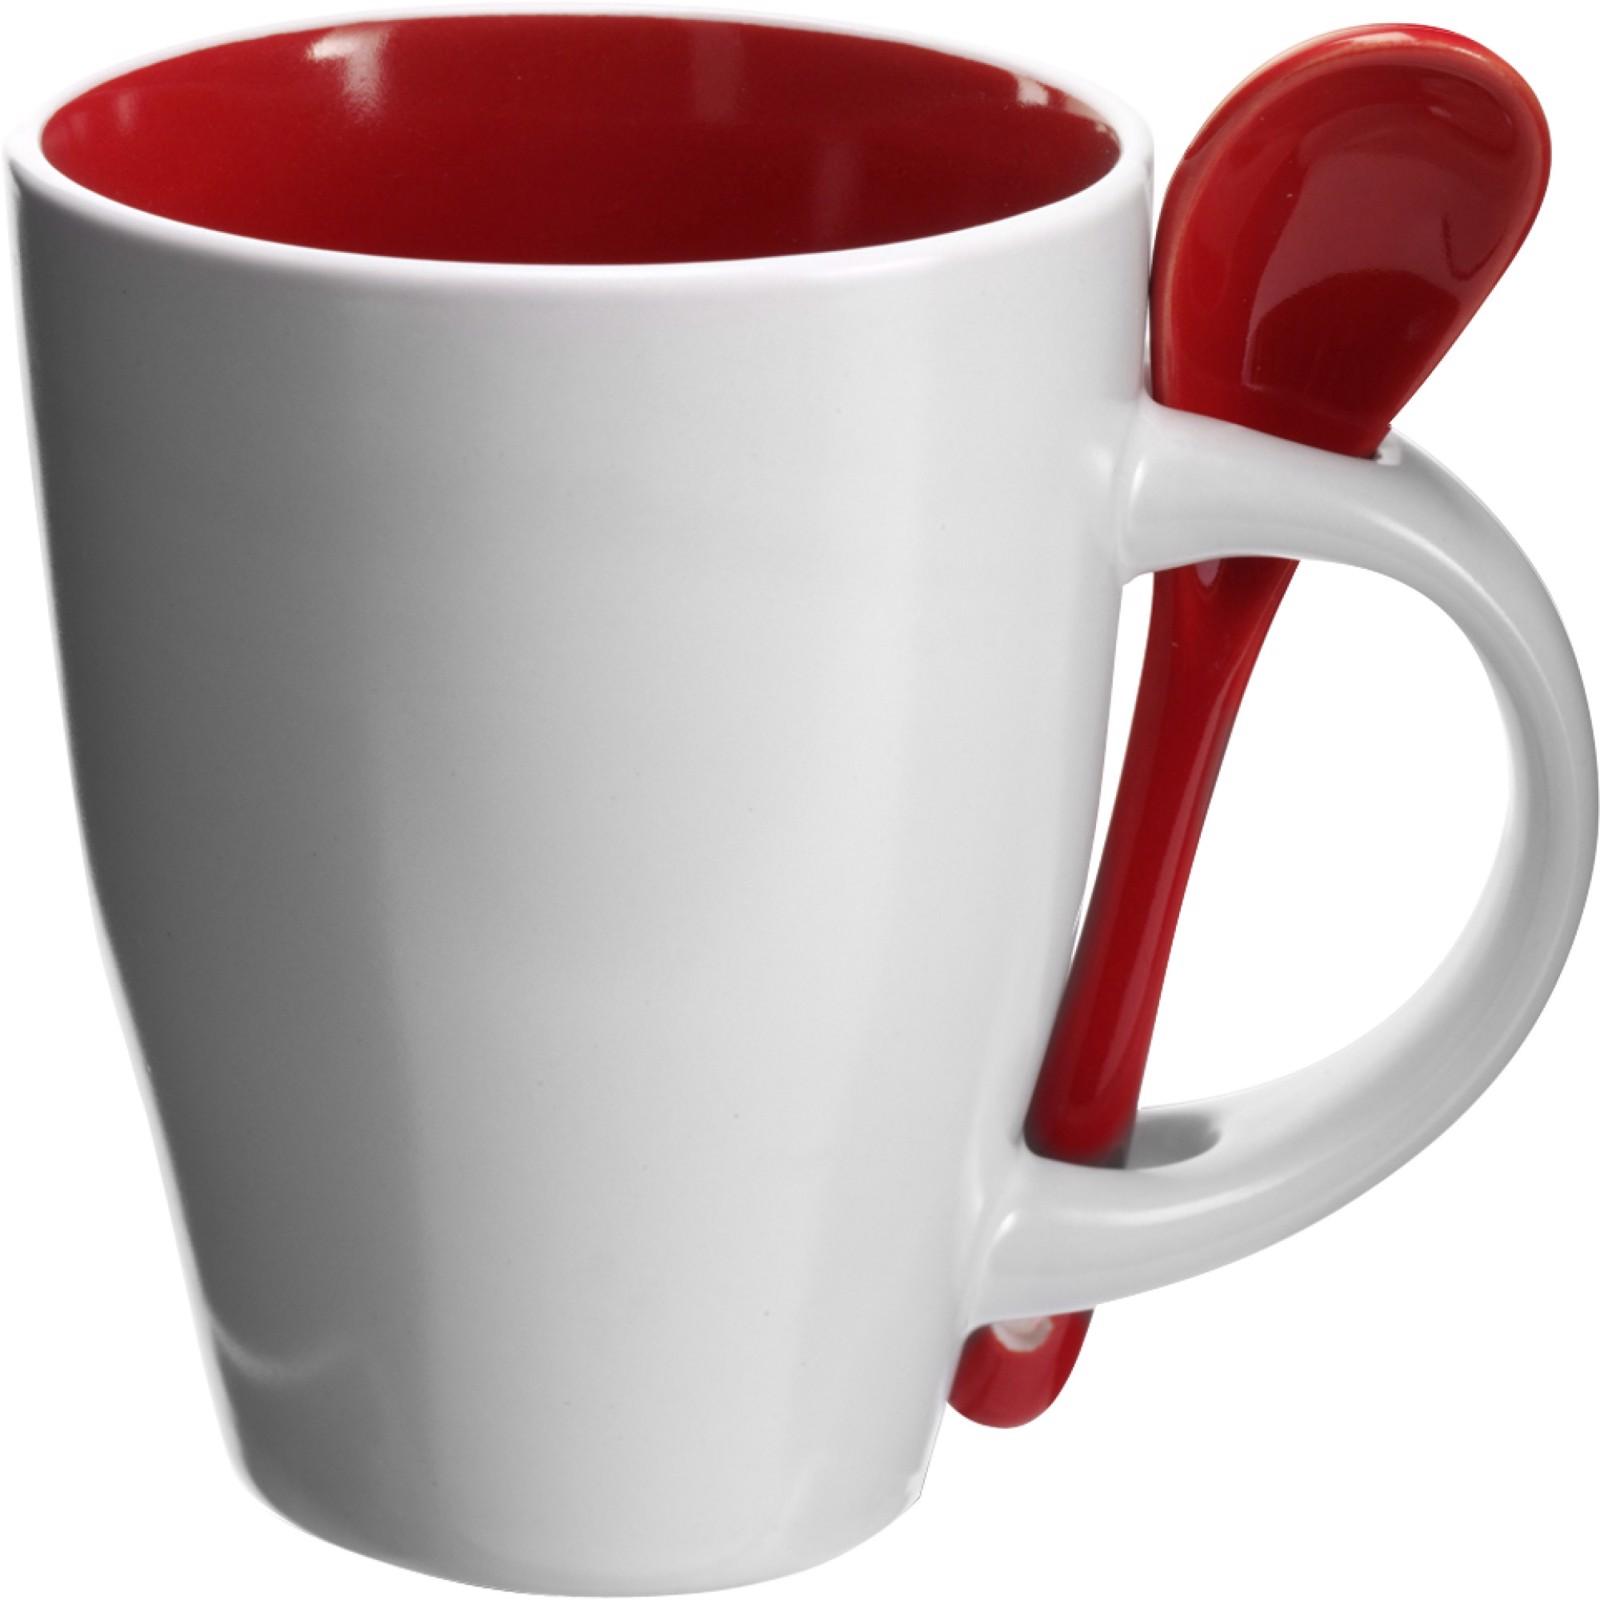 Ceramic mug with spoon - Red